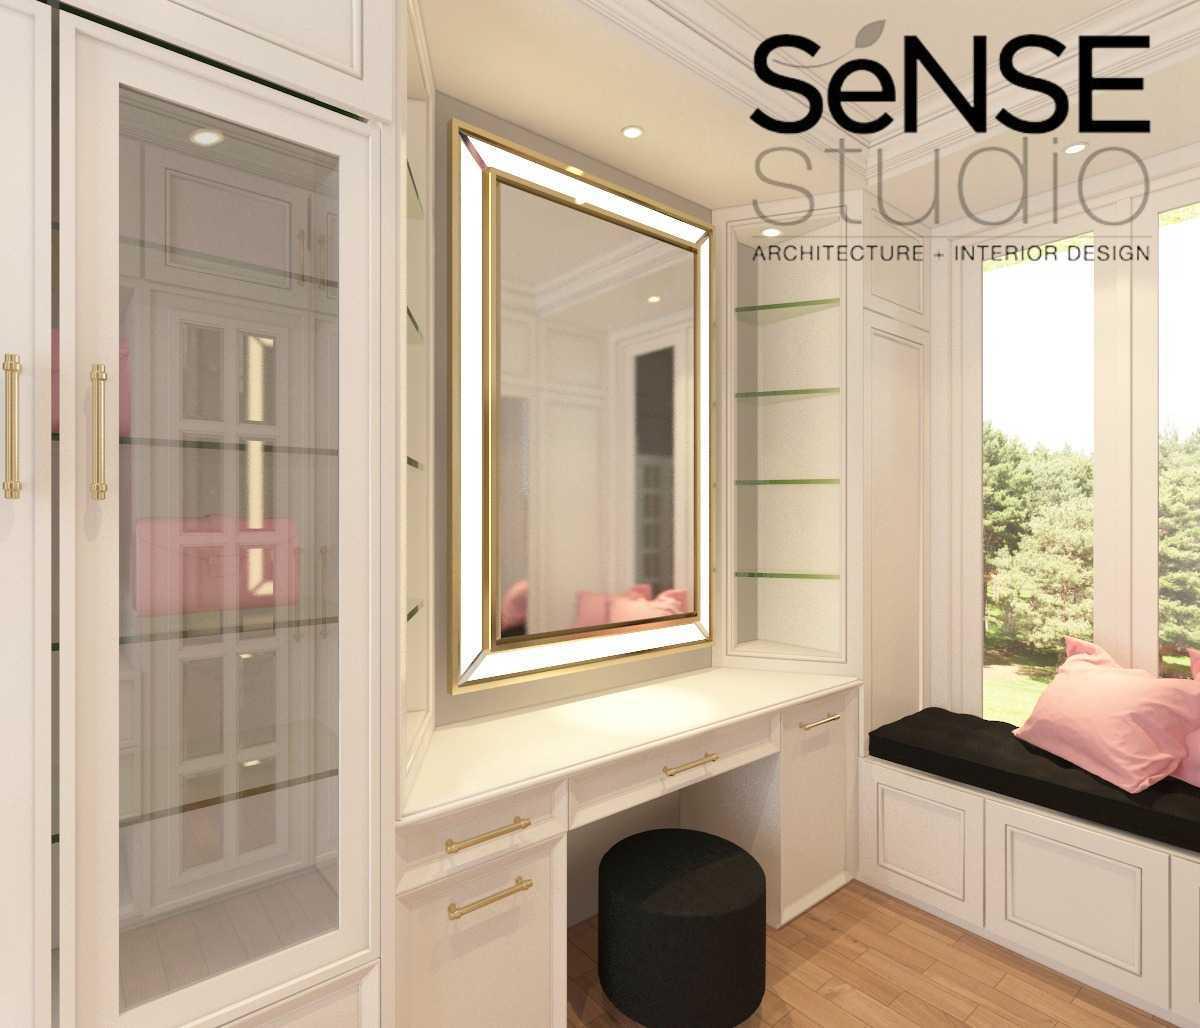 Sense Isle Studio Residence Surabaya Surabaya, Kota Sby, Jawa Timur, Indonesia Surabaya, Kota Sby, Jawa Timur, Indonesia Sense-Studio-Residence-Surabaya  80443